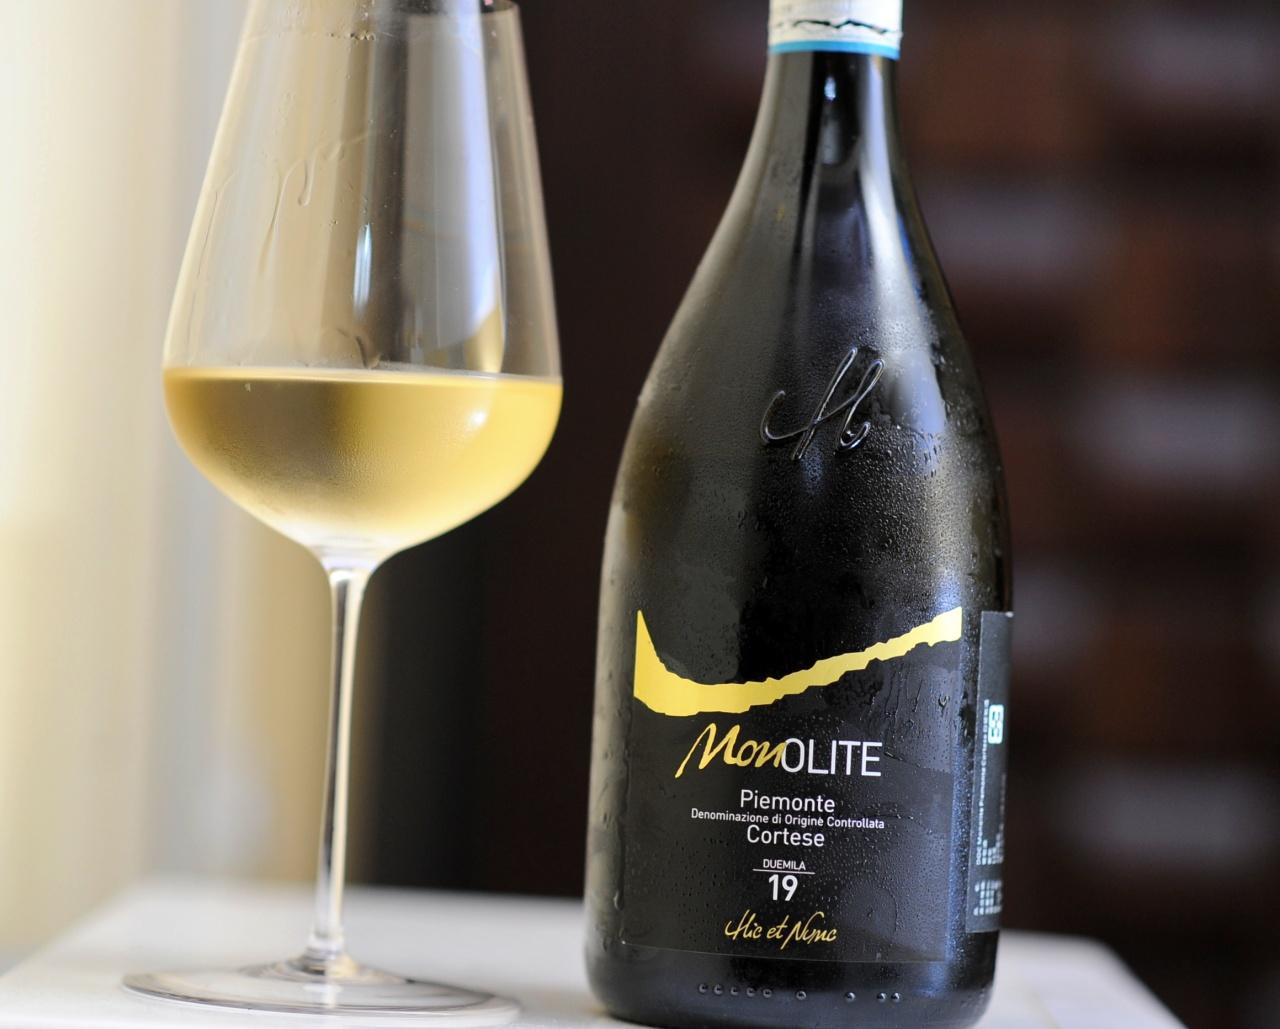 Monlite-Piemonte Cortese